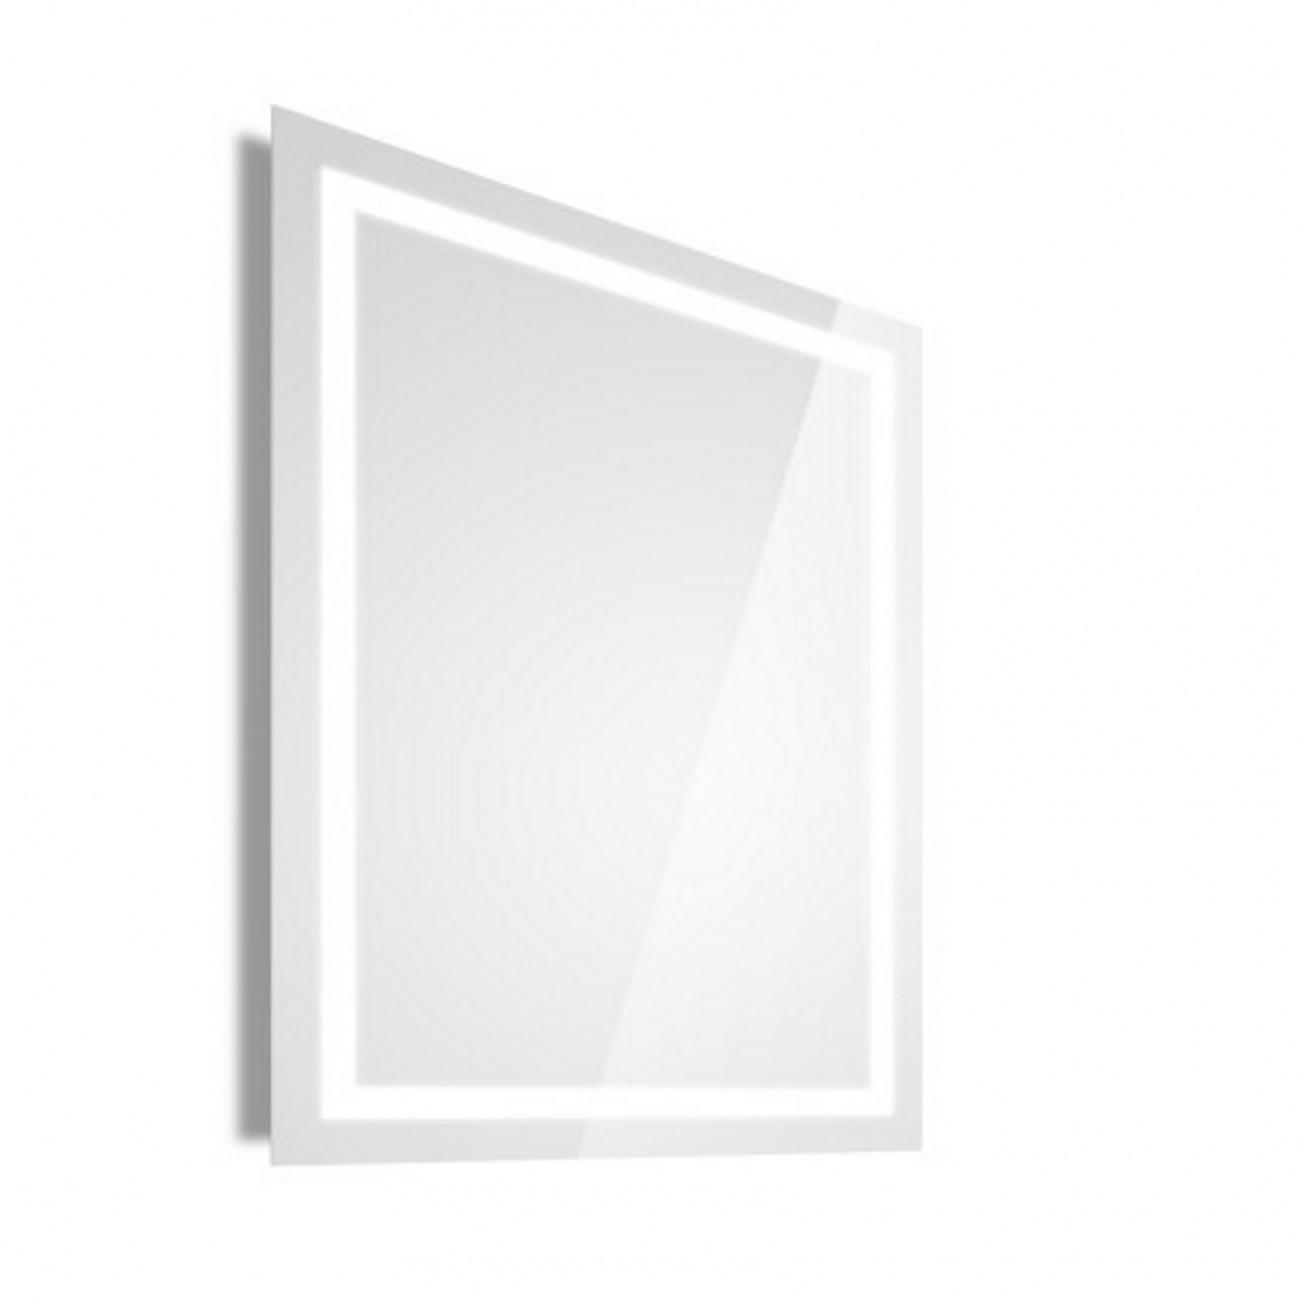 Lineabeta Speci Espejo con luz LED